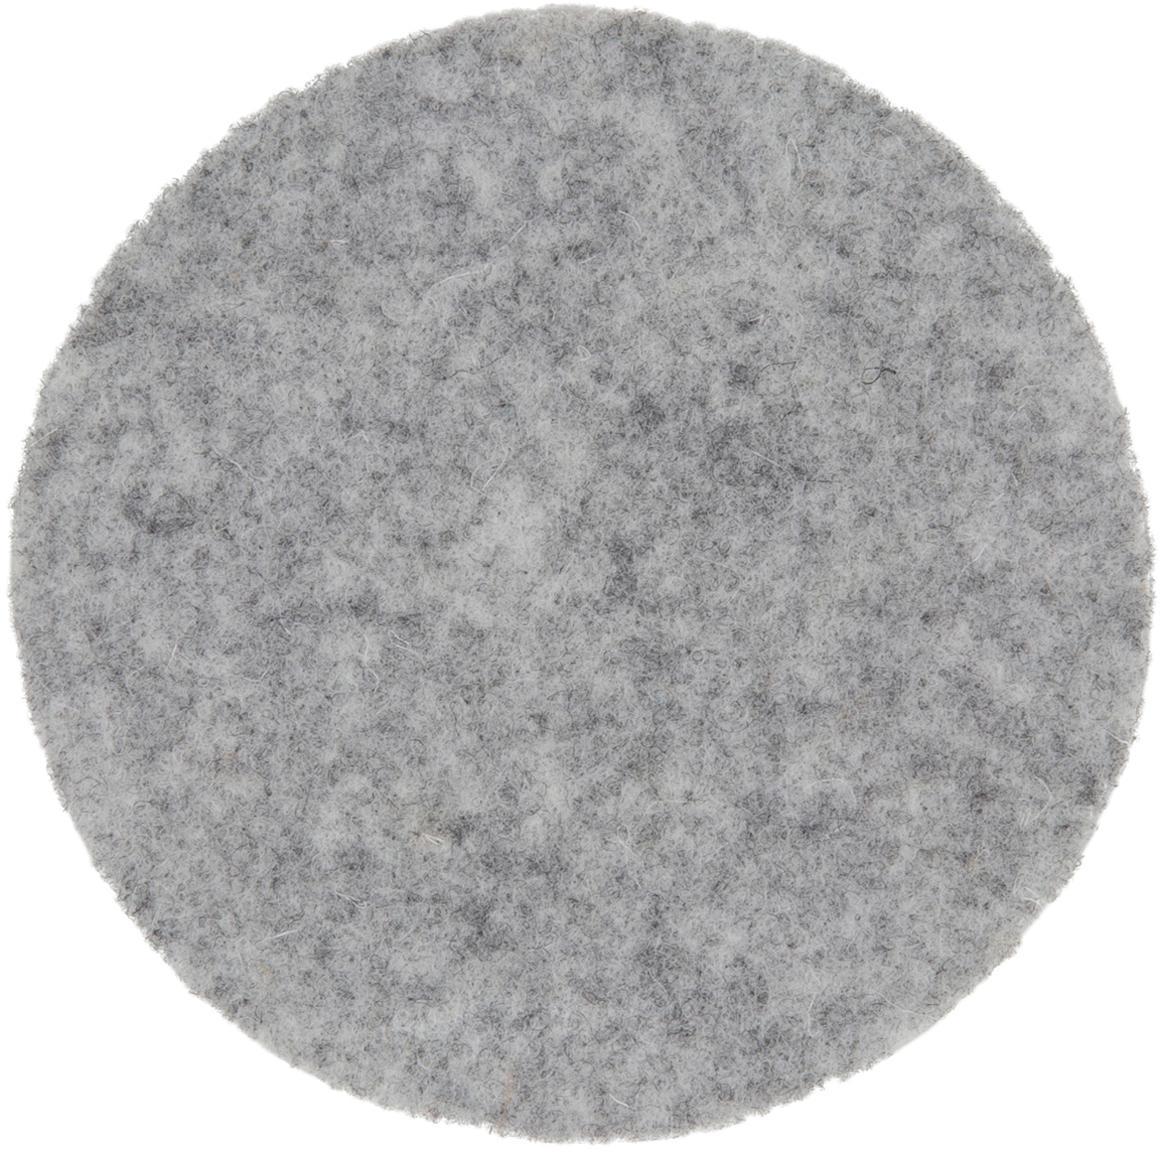 Wollen vilt onderzetter Leandra, 6 stuks, 90% wol, 10% polyethyleen, Lichtgrijs, Ø 10 cm